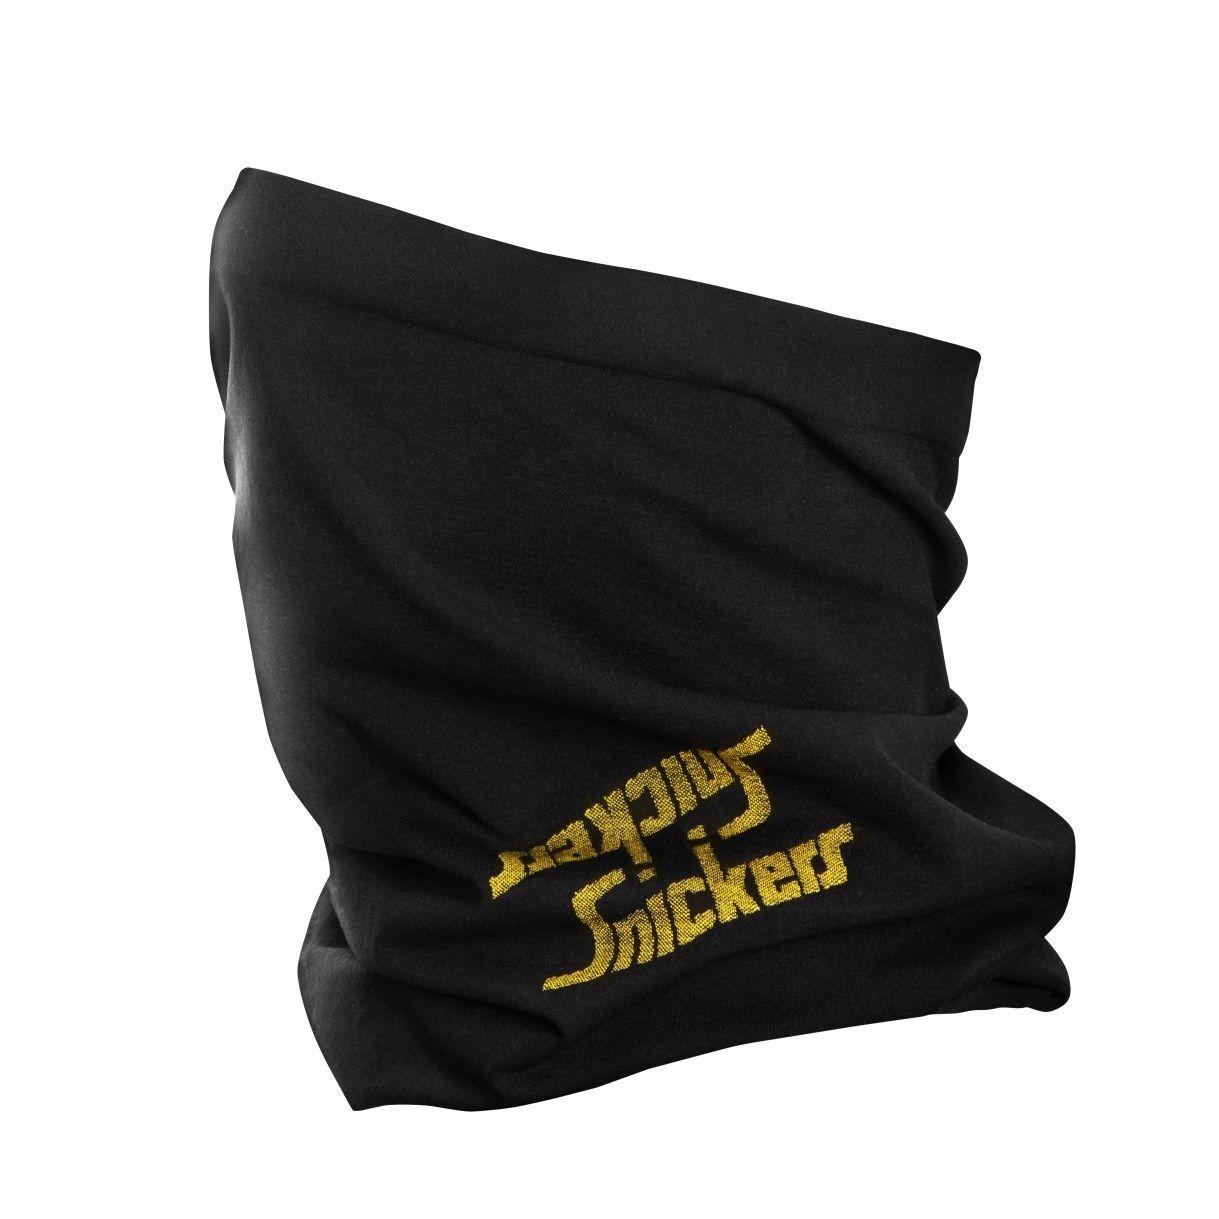 Snickers 9054 FlexiWork Seamless Multifunctional Headwear Black One Size